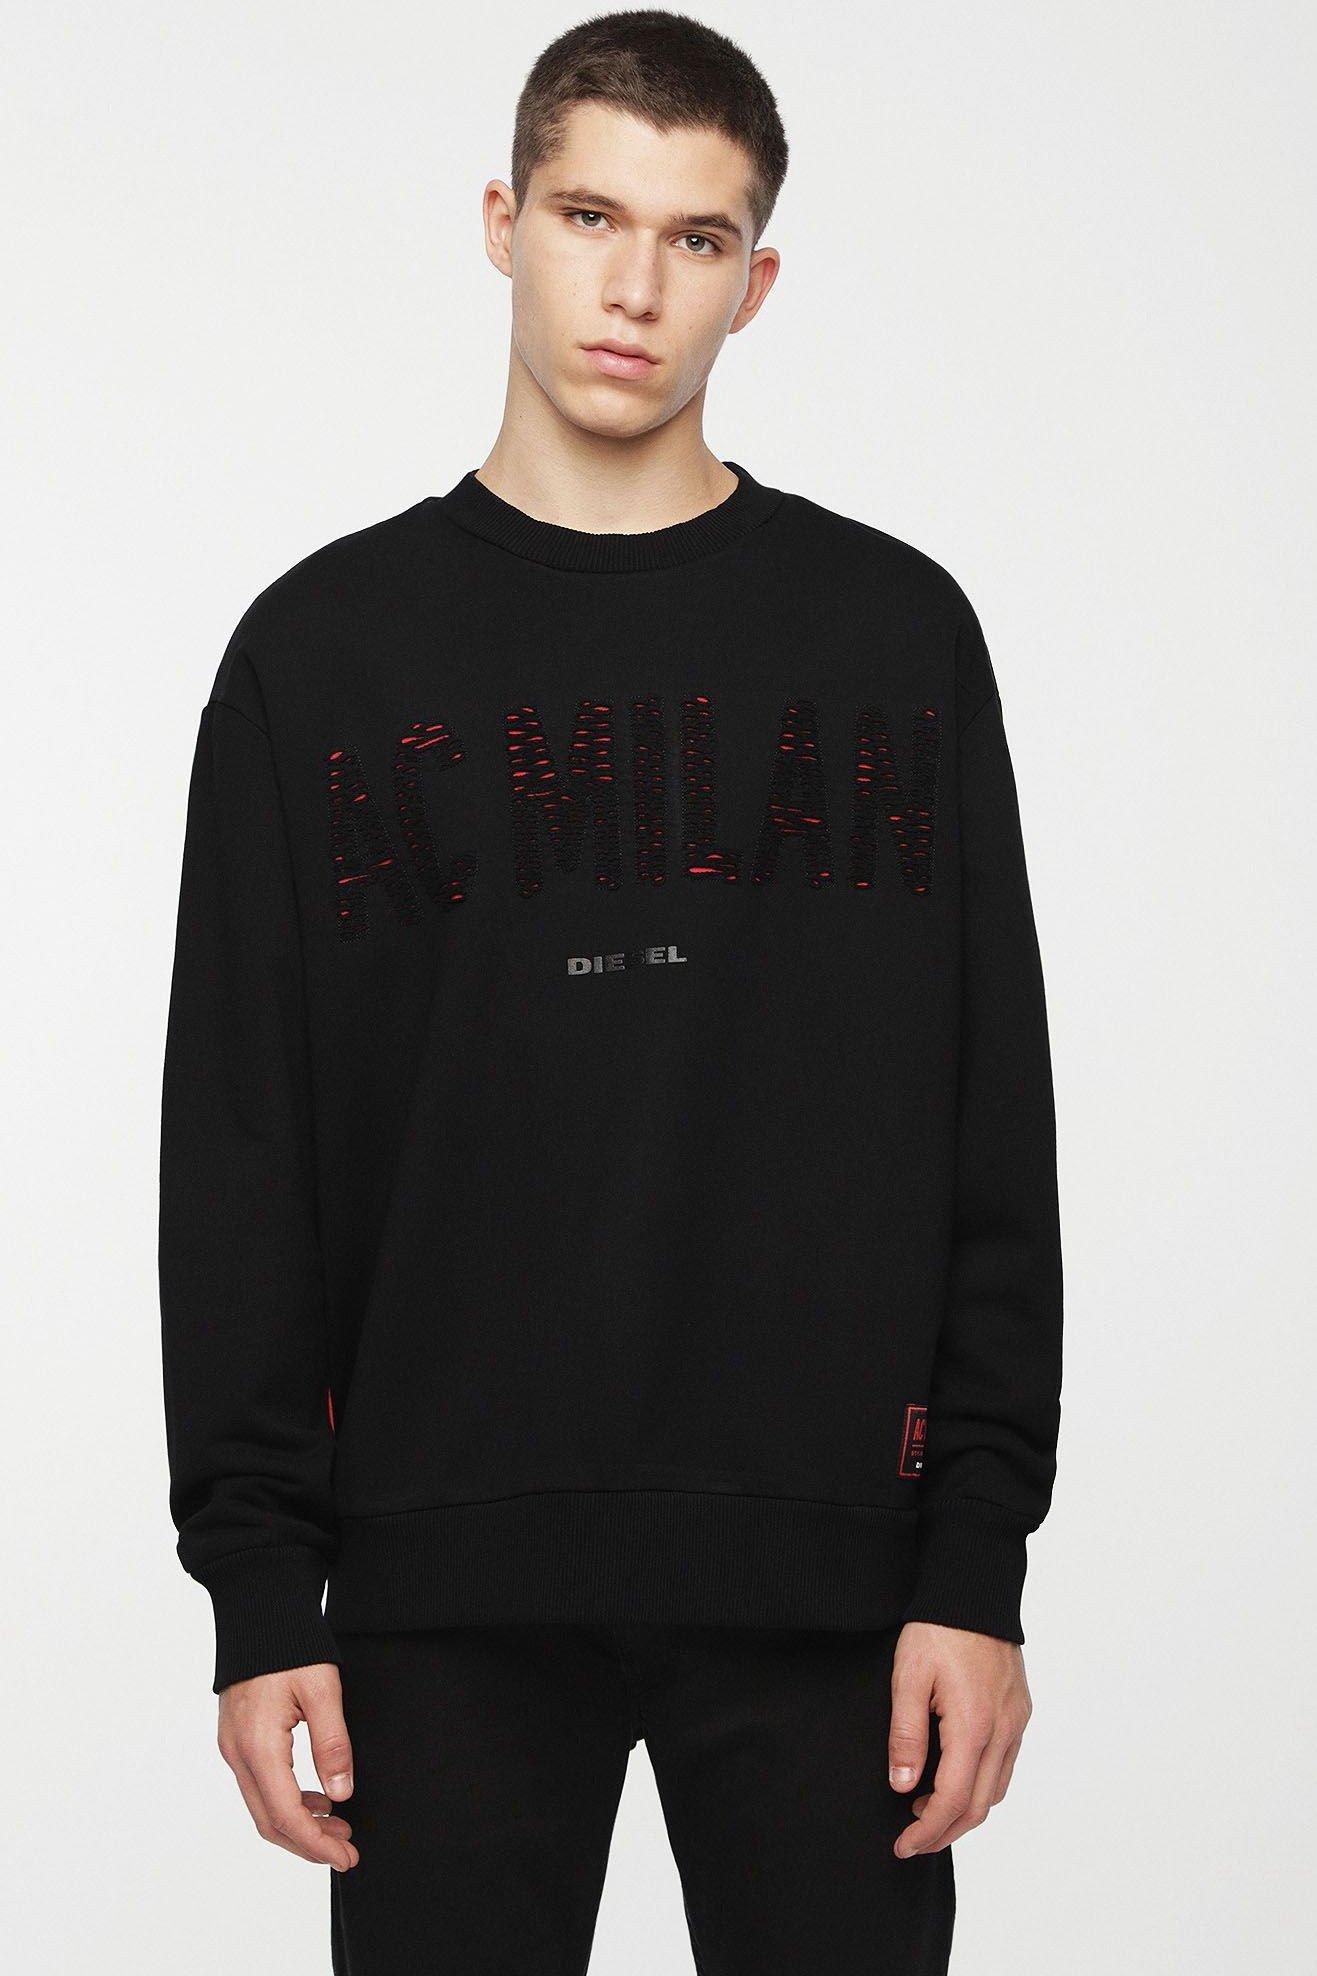 Diesel Men's Sweatshirt Various Colours 270115 - black 2XL